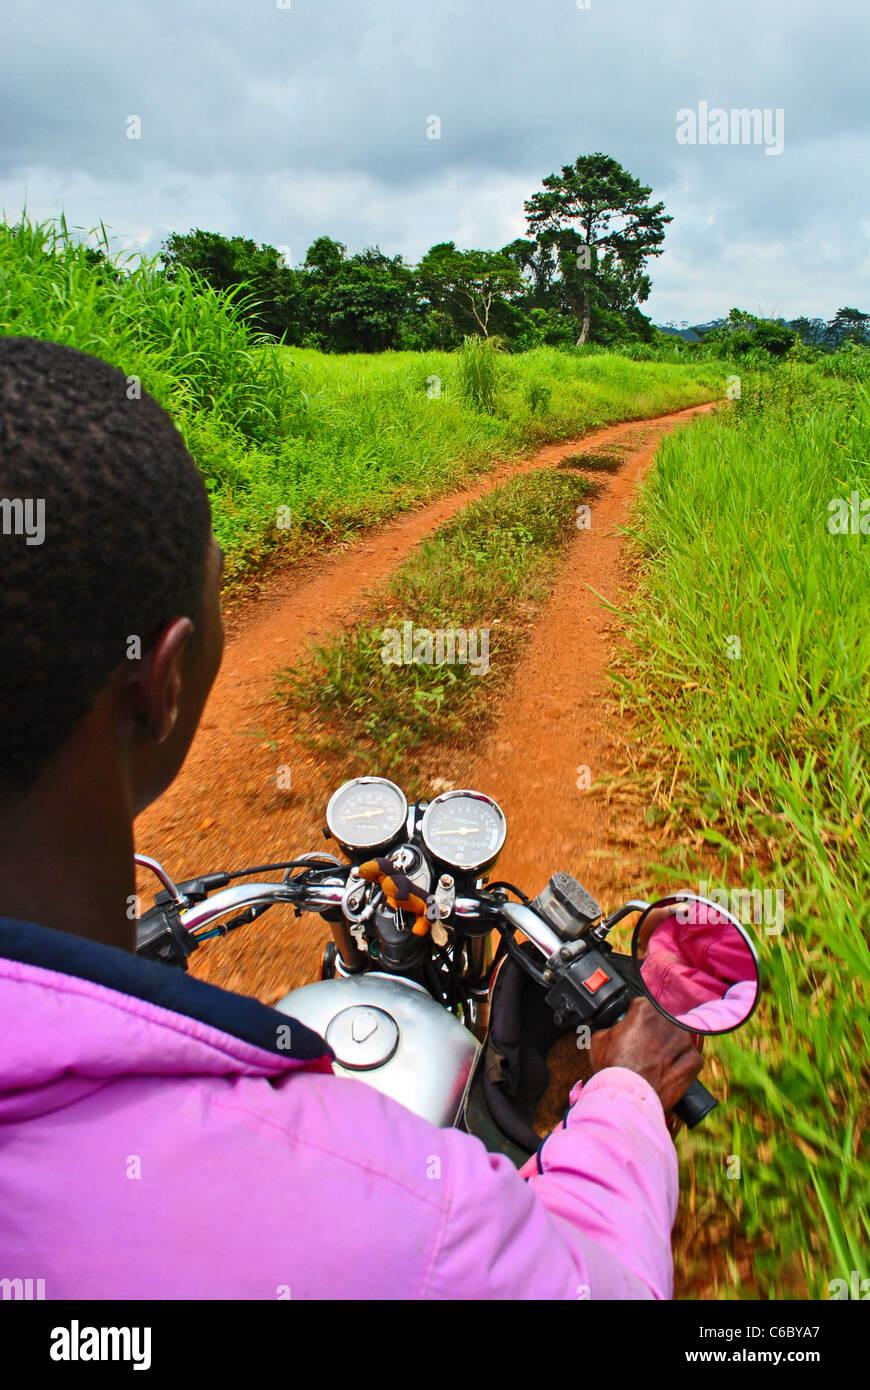 Motorbike taxi near Gbarnga, Liberia, West Africa - Stock Image